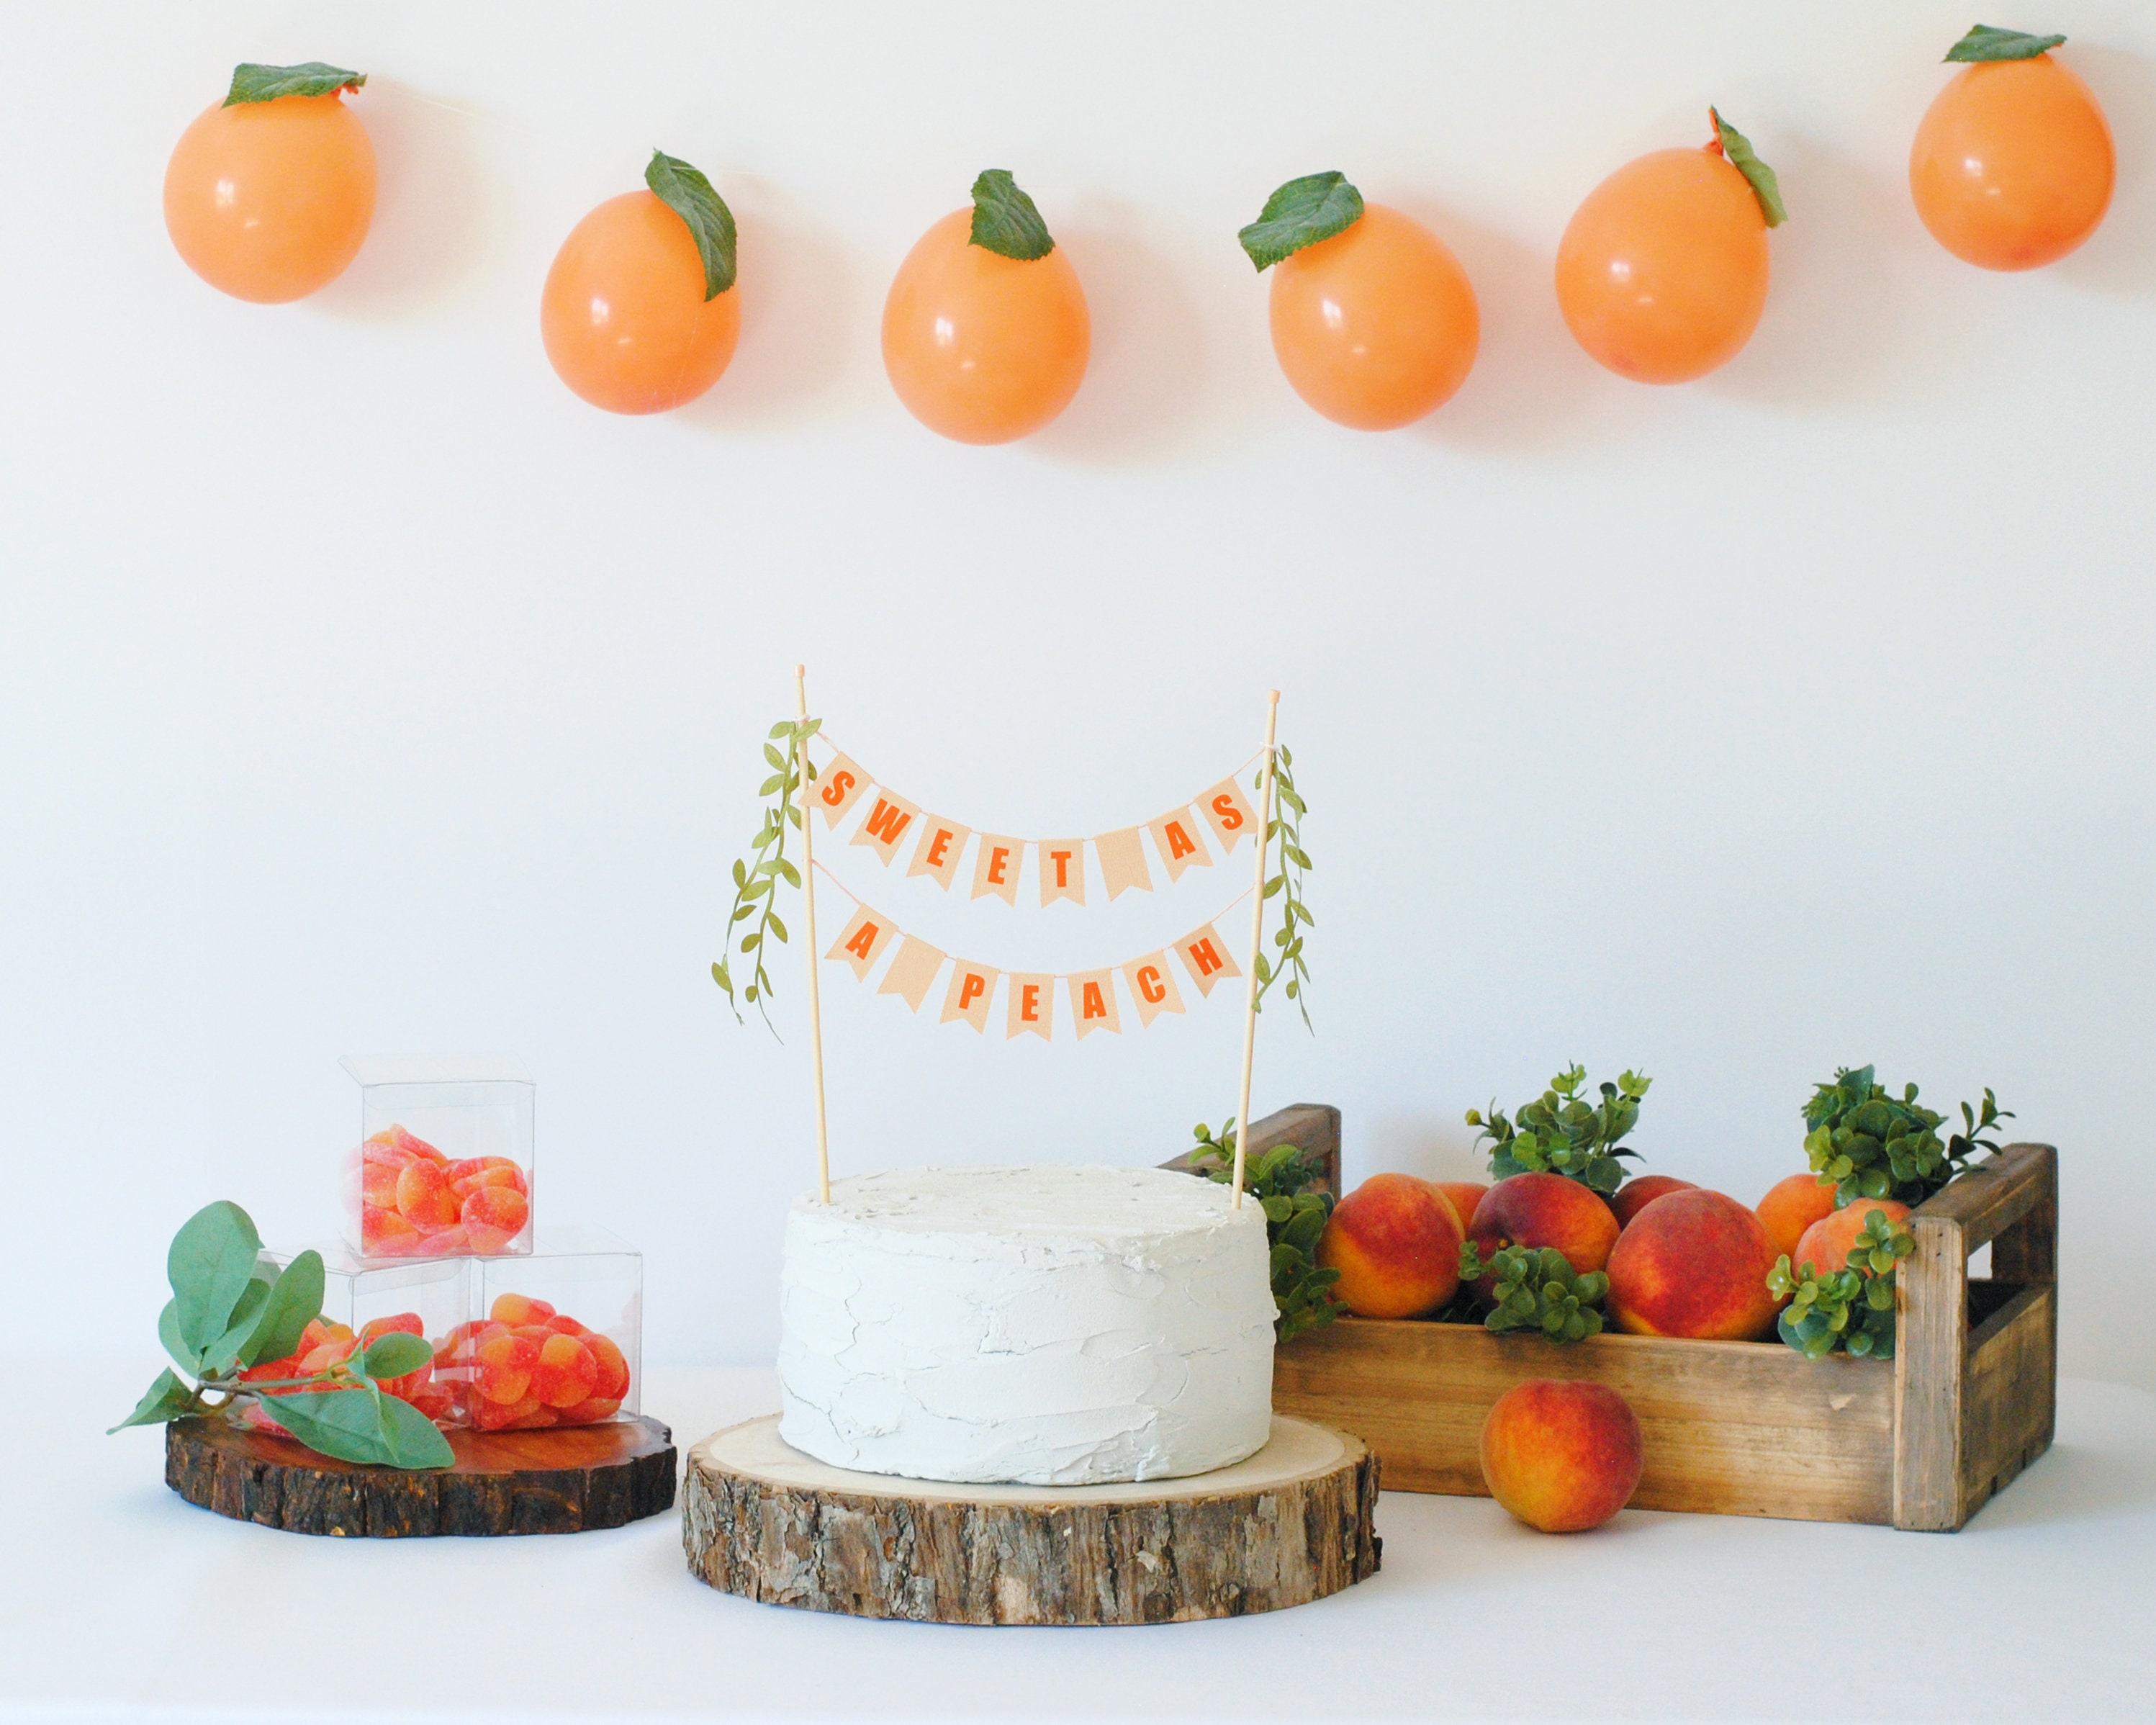 First Birthday Theme Ideas - sweet as a peach, sweet one birthday ideas